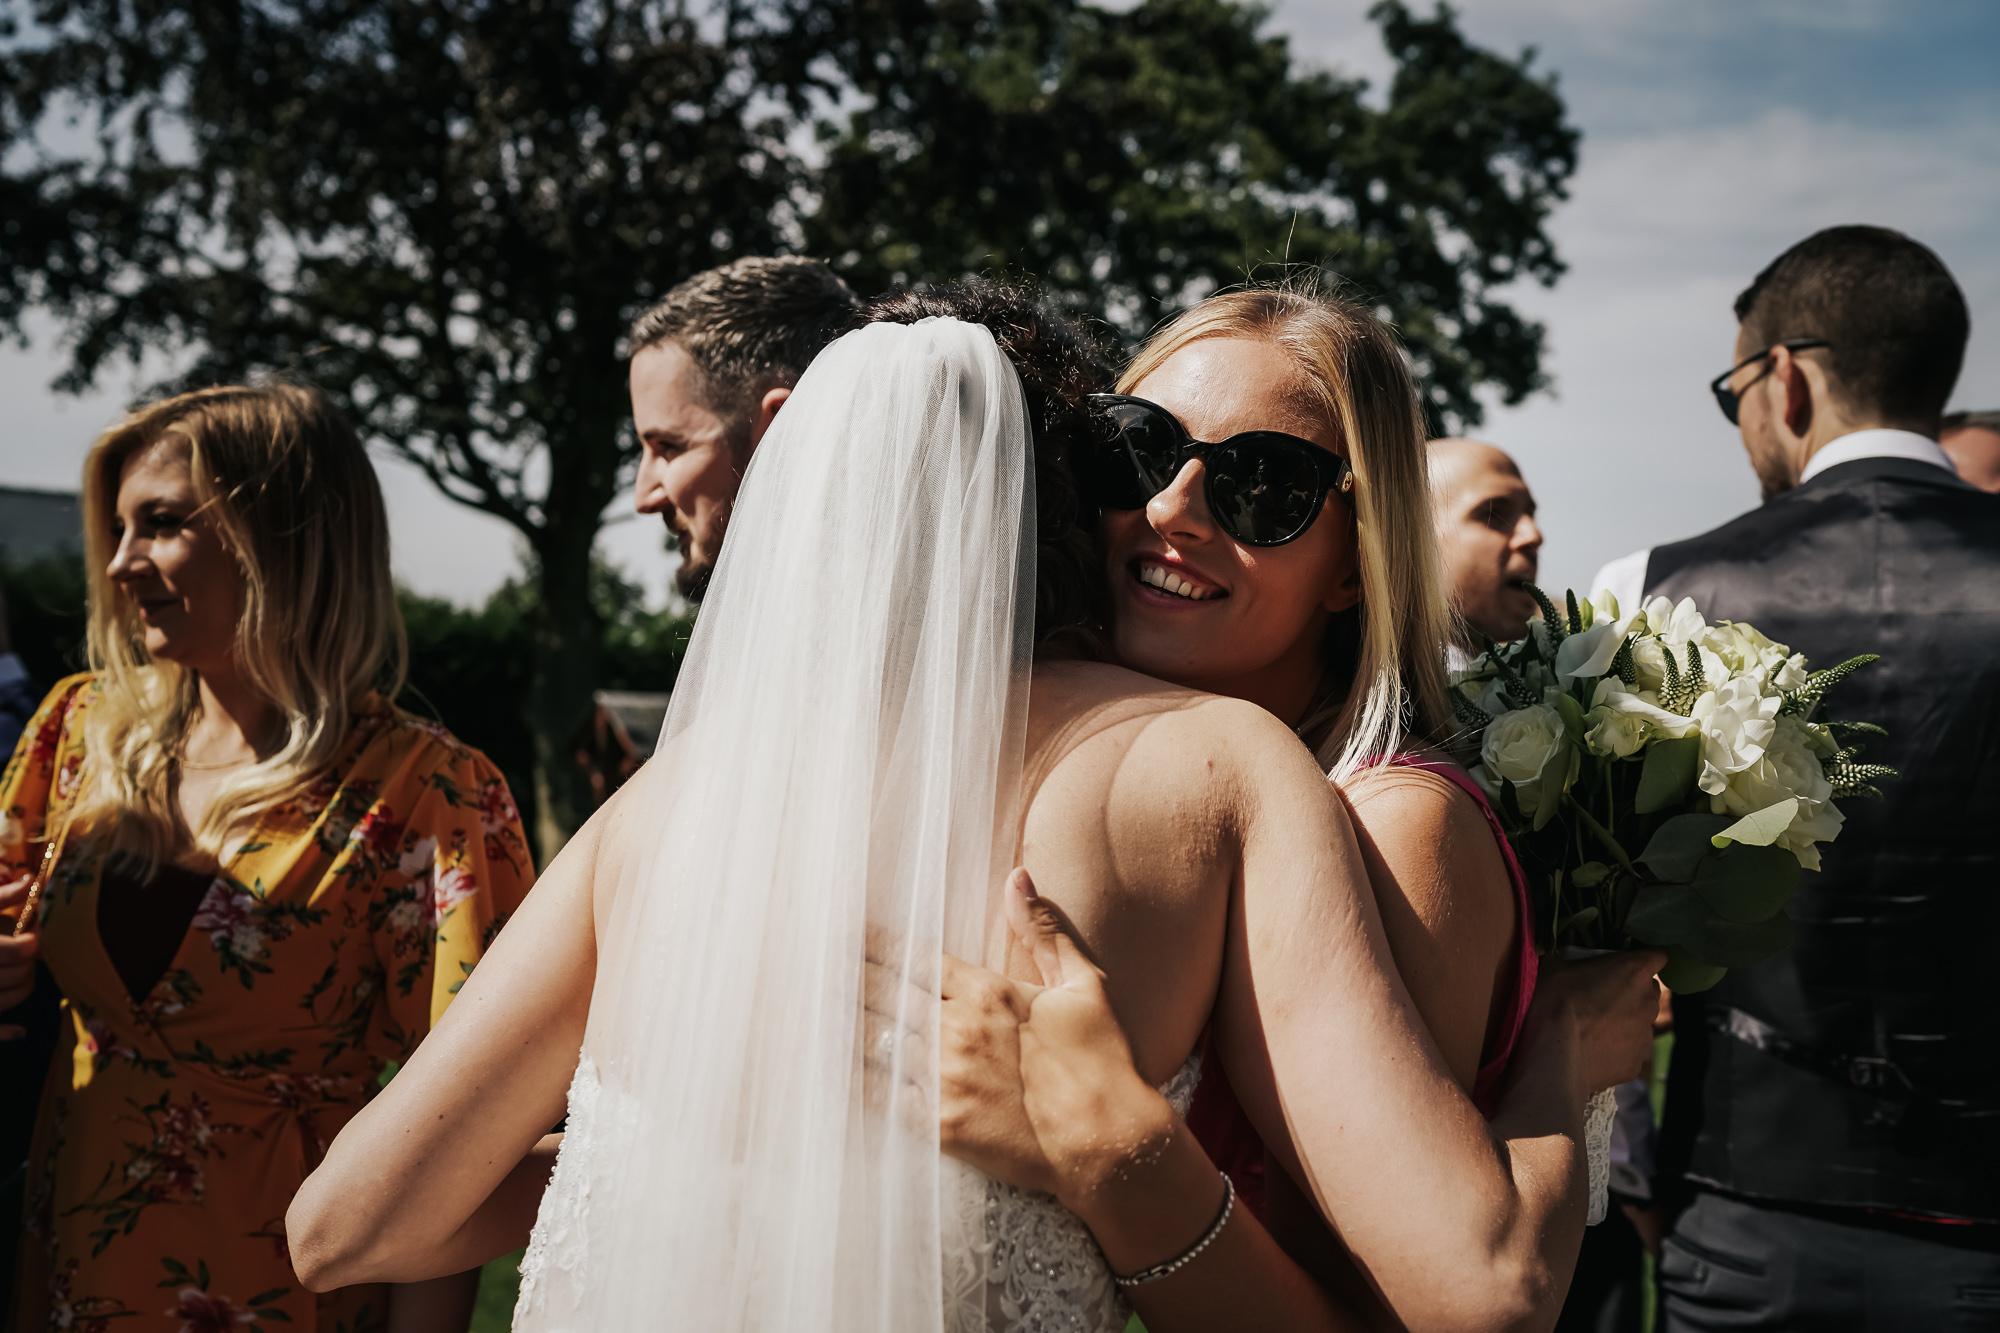 West Tower Wedding Venue Orkskirk Lancashire Wedding Photography cheshire wedding photographer (19 of 47).jpg